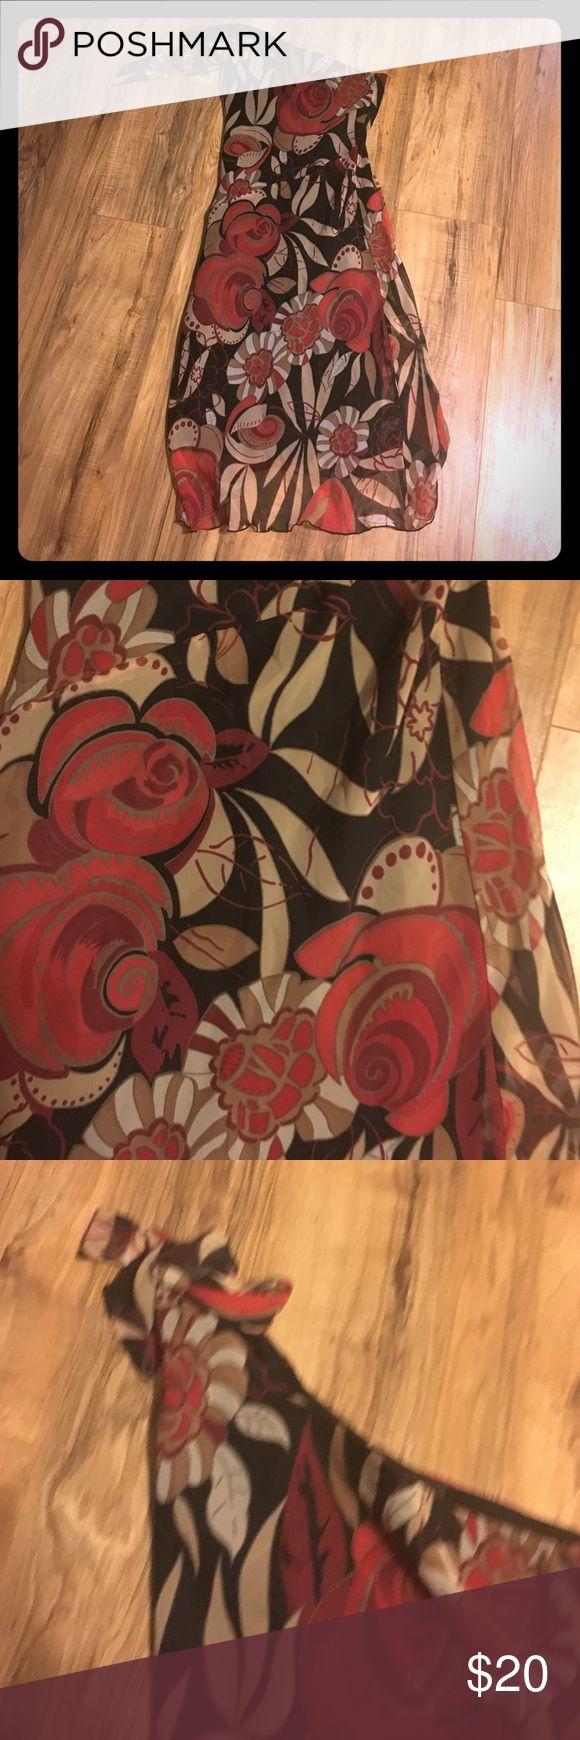 One strap dress Black and red floral print midi dress Dresses One Shoulder